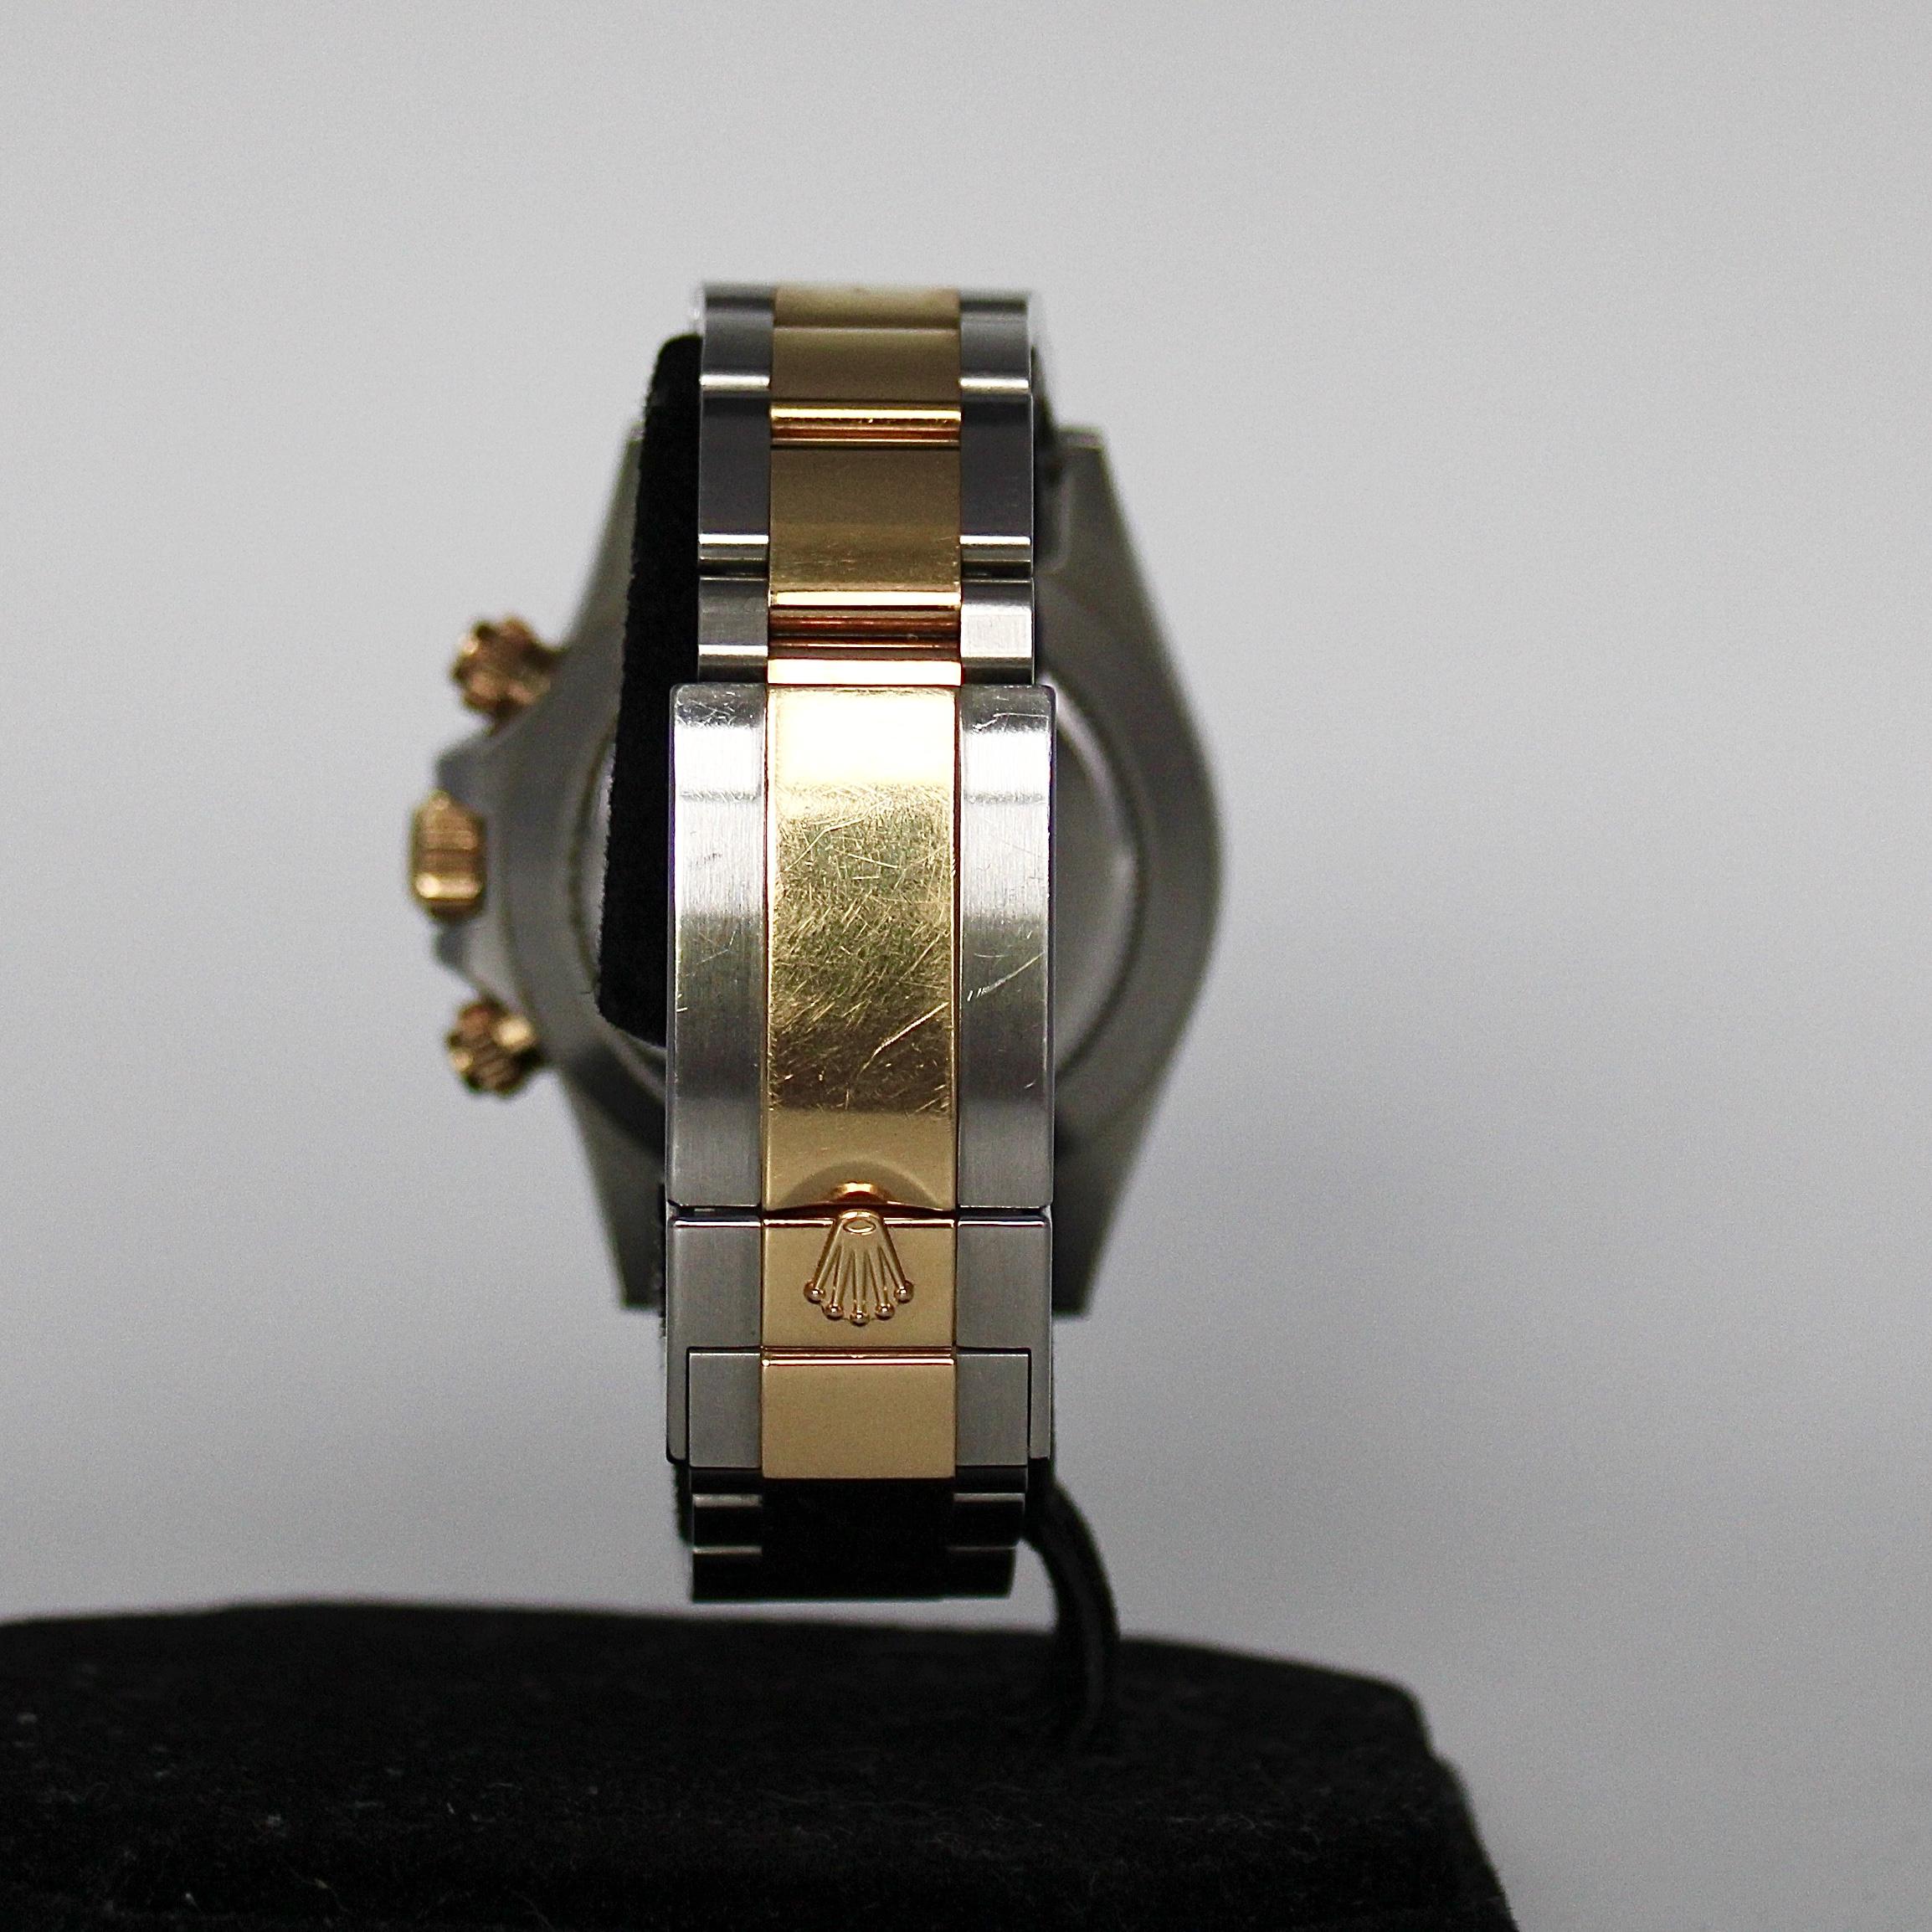 Rolex Daytona ref 116523 - Image 5 of 8